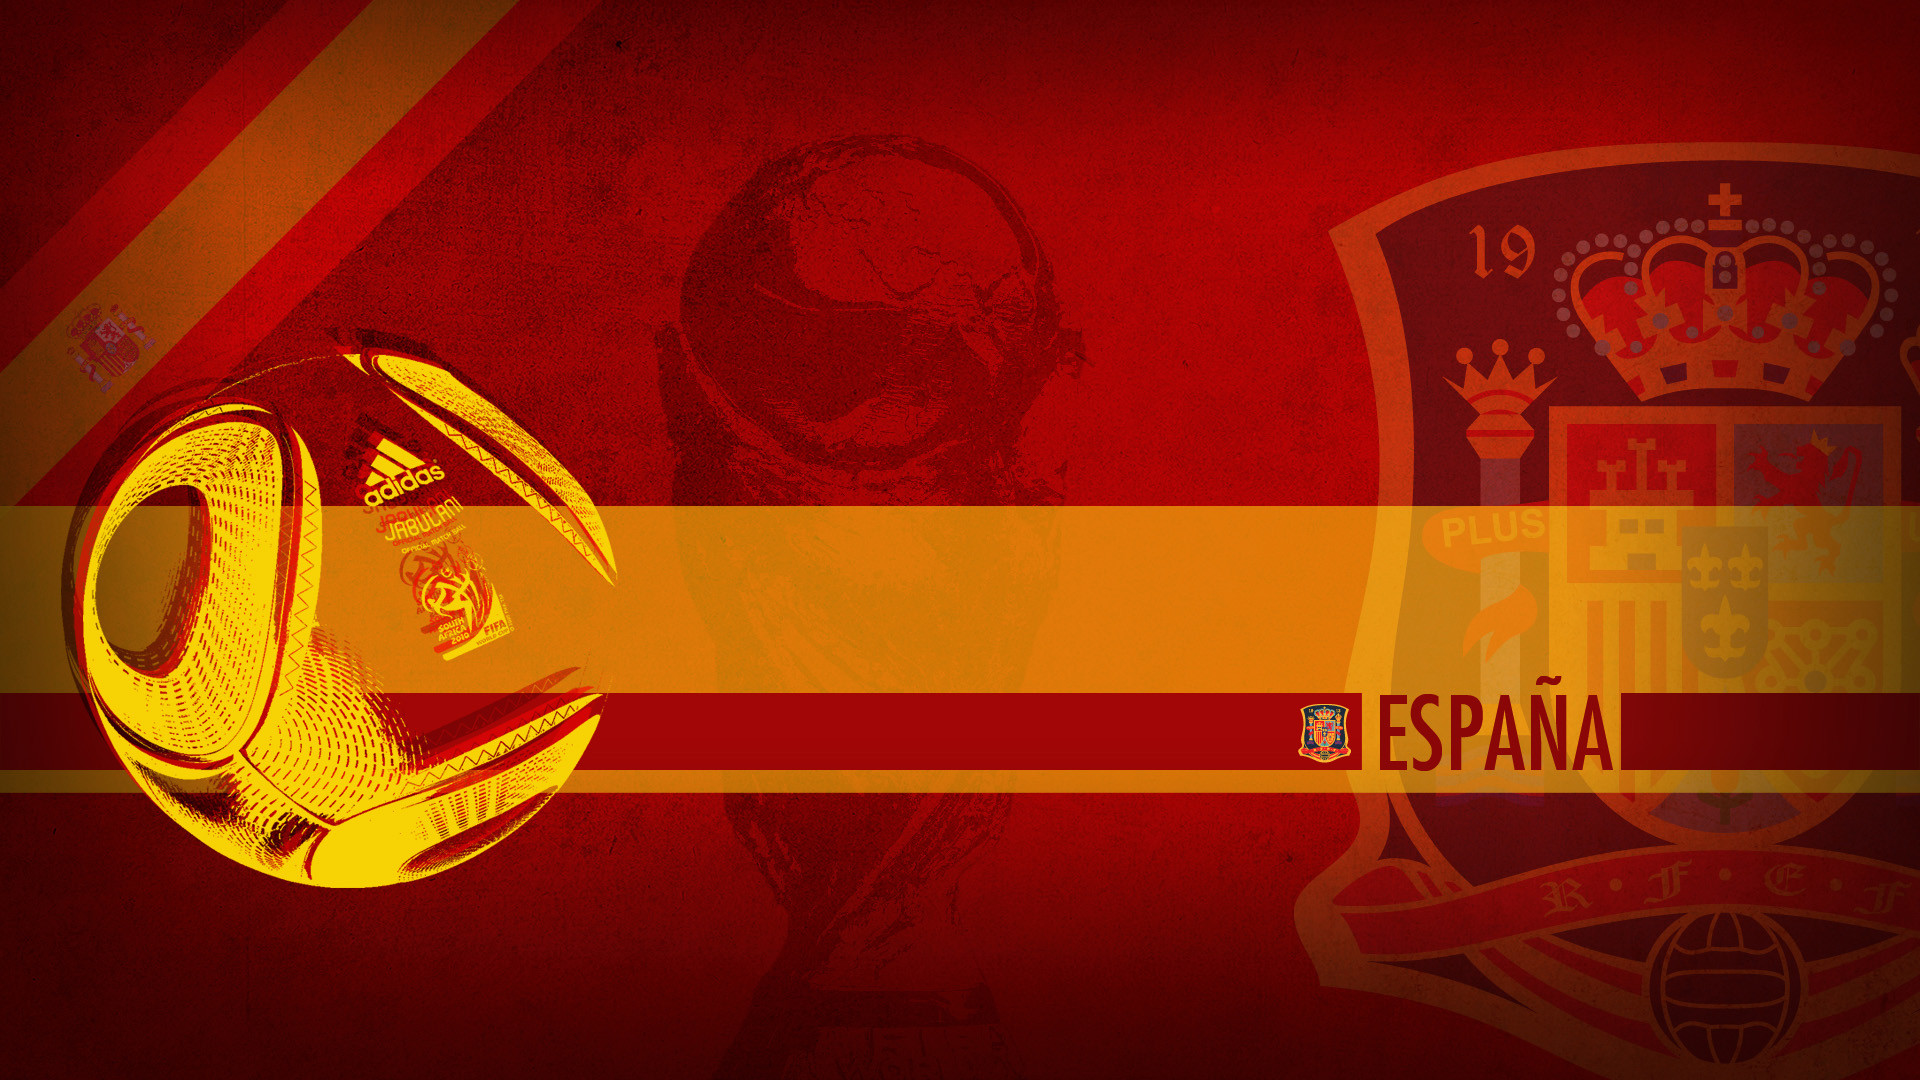 Fondo Espana Hd: Spain Soccer Team Wallpaper ·① WallpaperTag